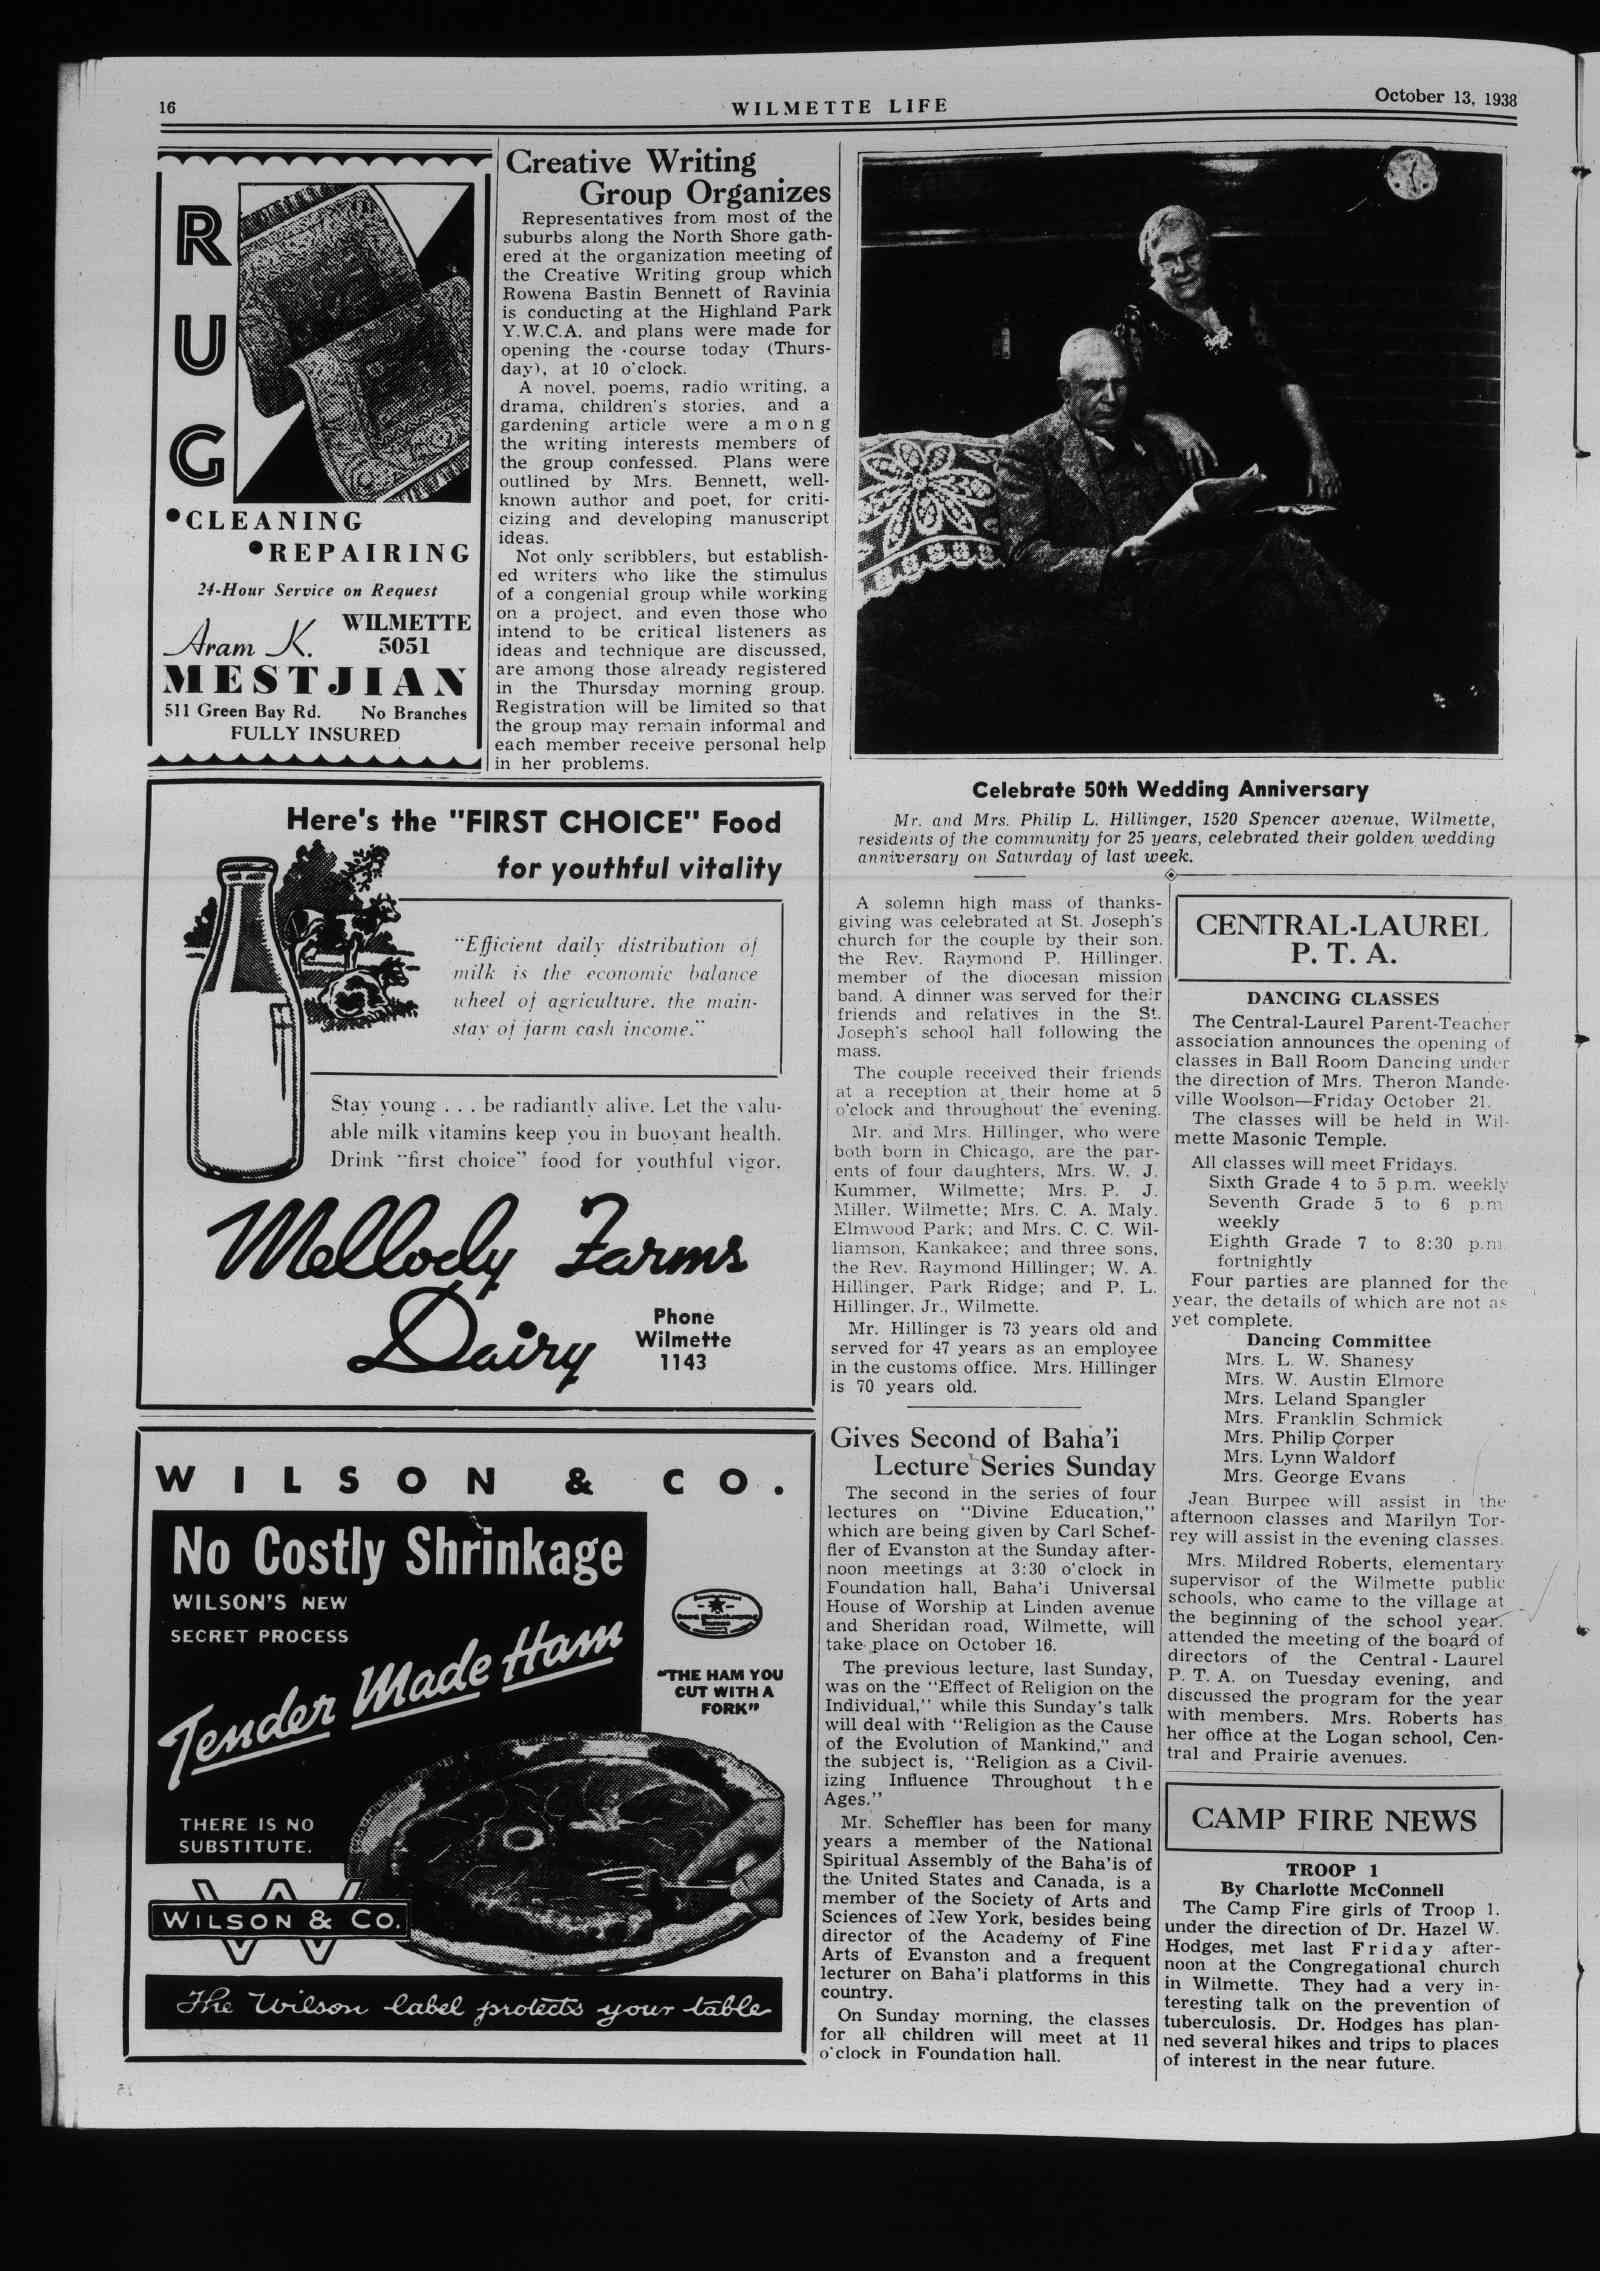 Wilmette Life (Wilmette, Illinois), 13 Oct 1938